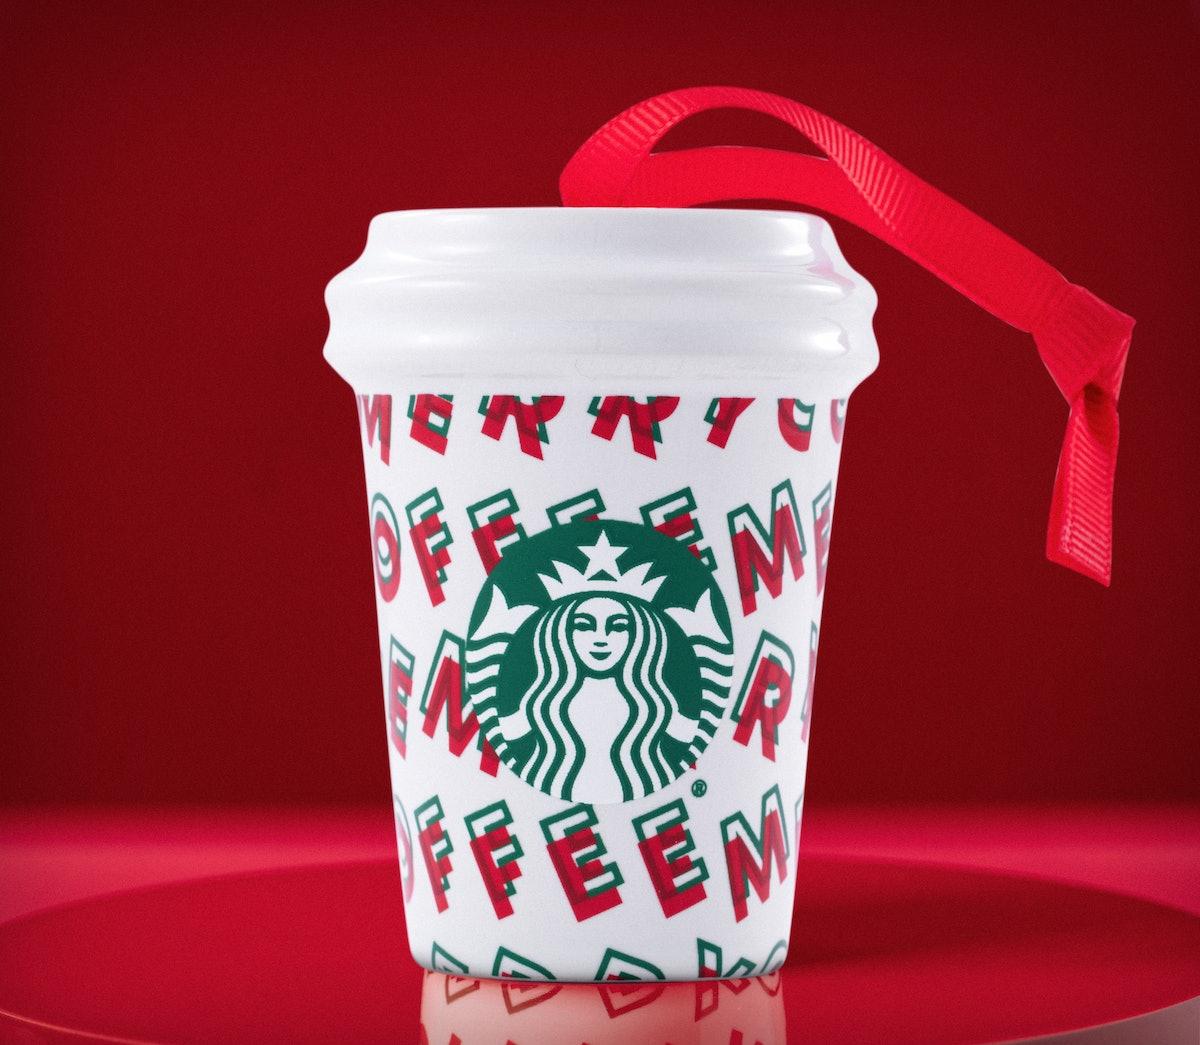 Starbucks Nov. 14 Happy Hour is a BOGO deal.